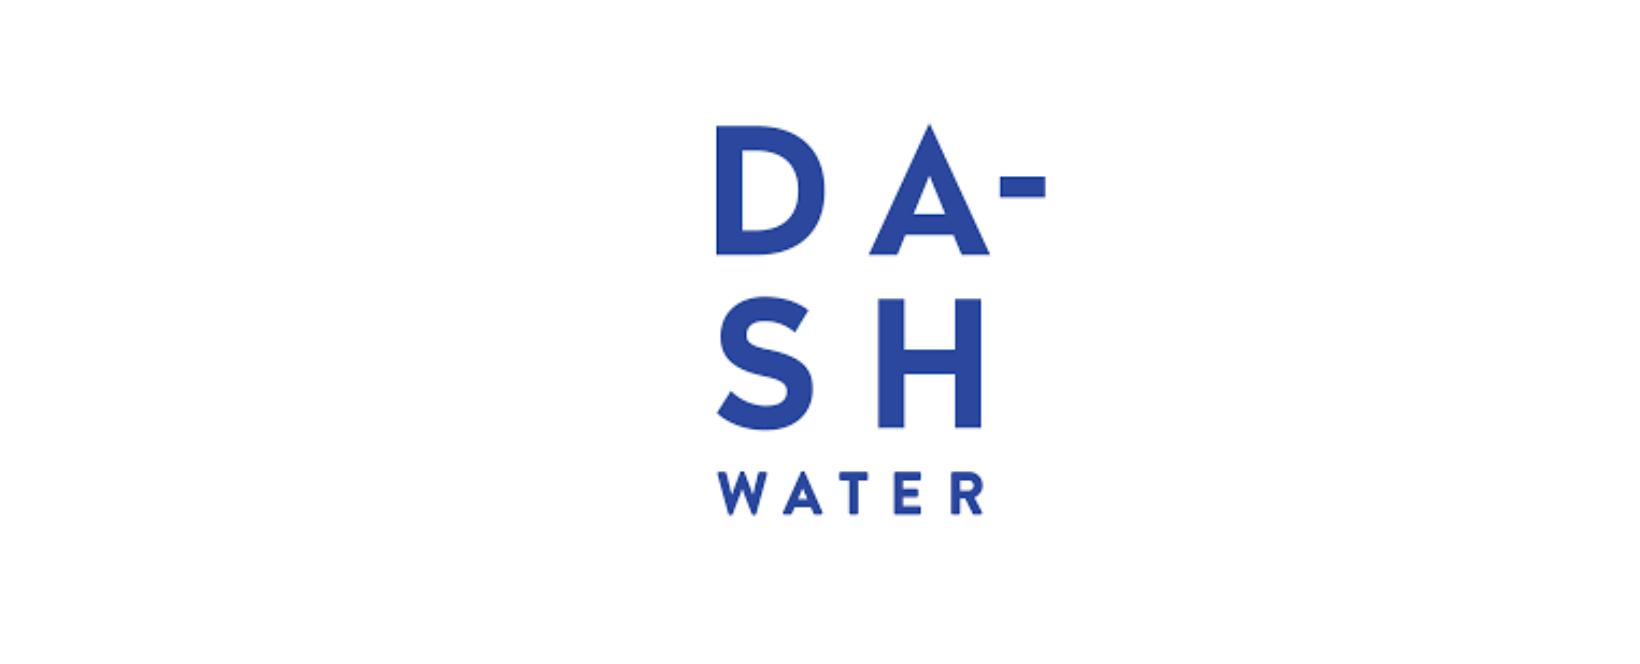 Dash Water UK Discount Code 2021